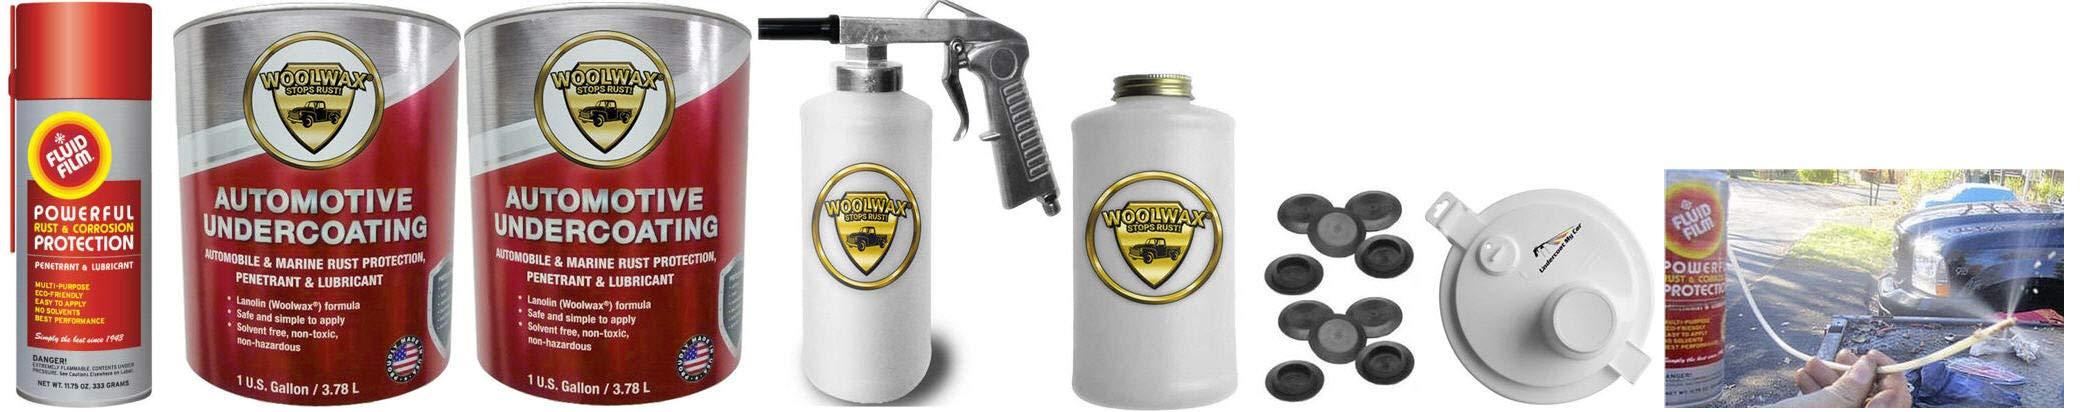 Fluid Film & Woolwax 2 Gallon Undercoating Kit Bundle. Straw (Clear) Color. Standard Spray Gun. by woolwax (Image #1)